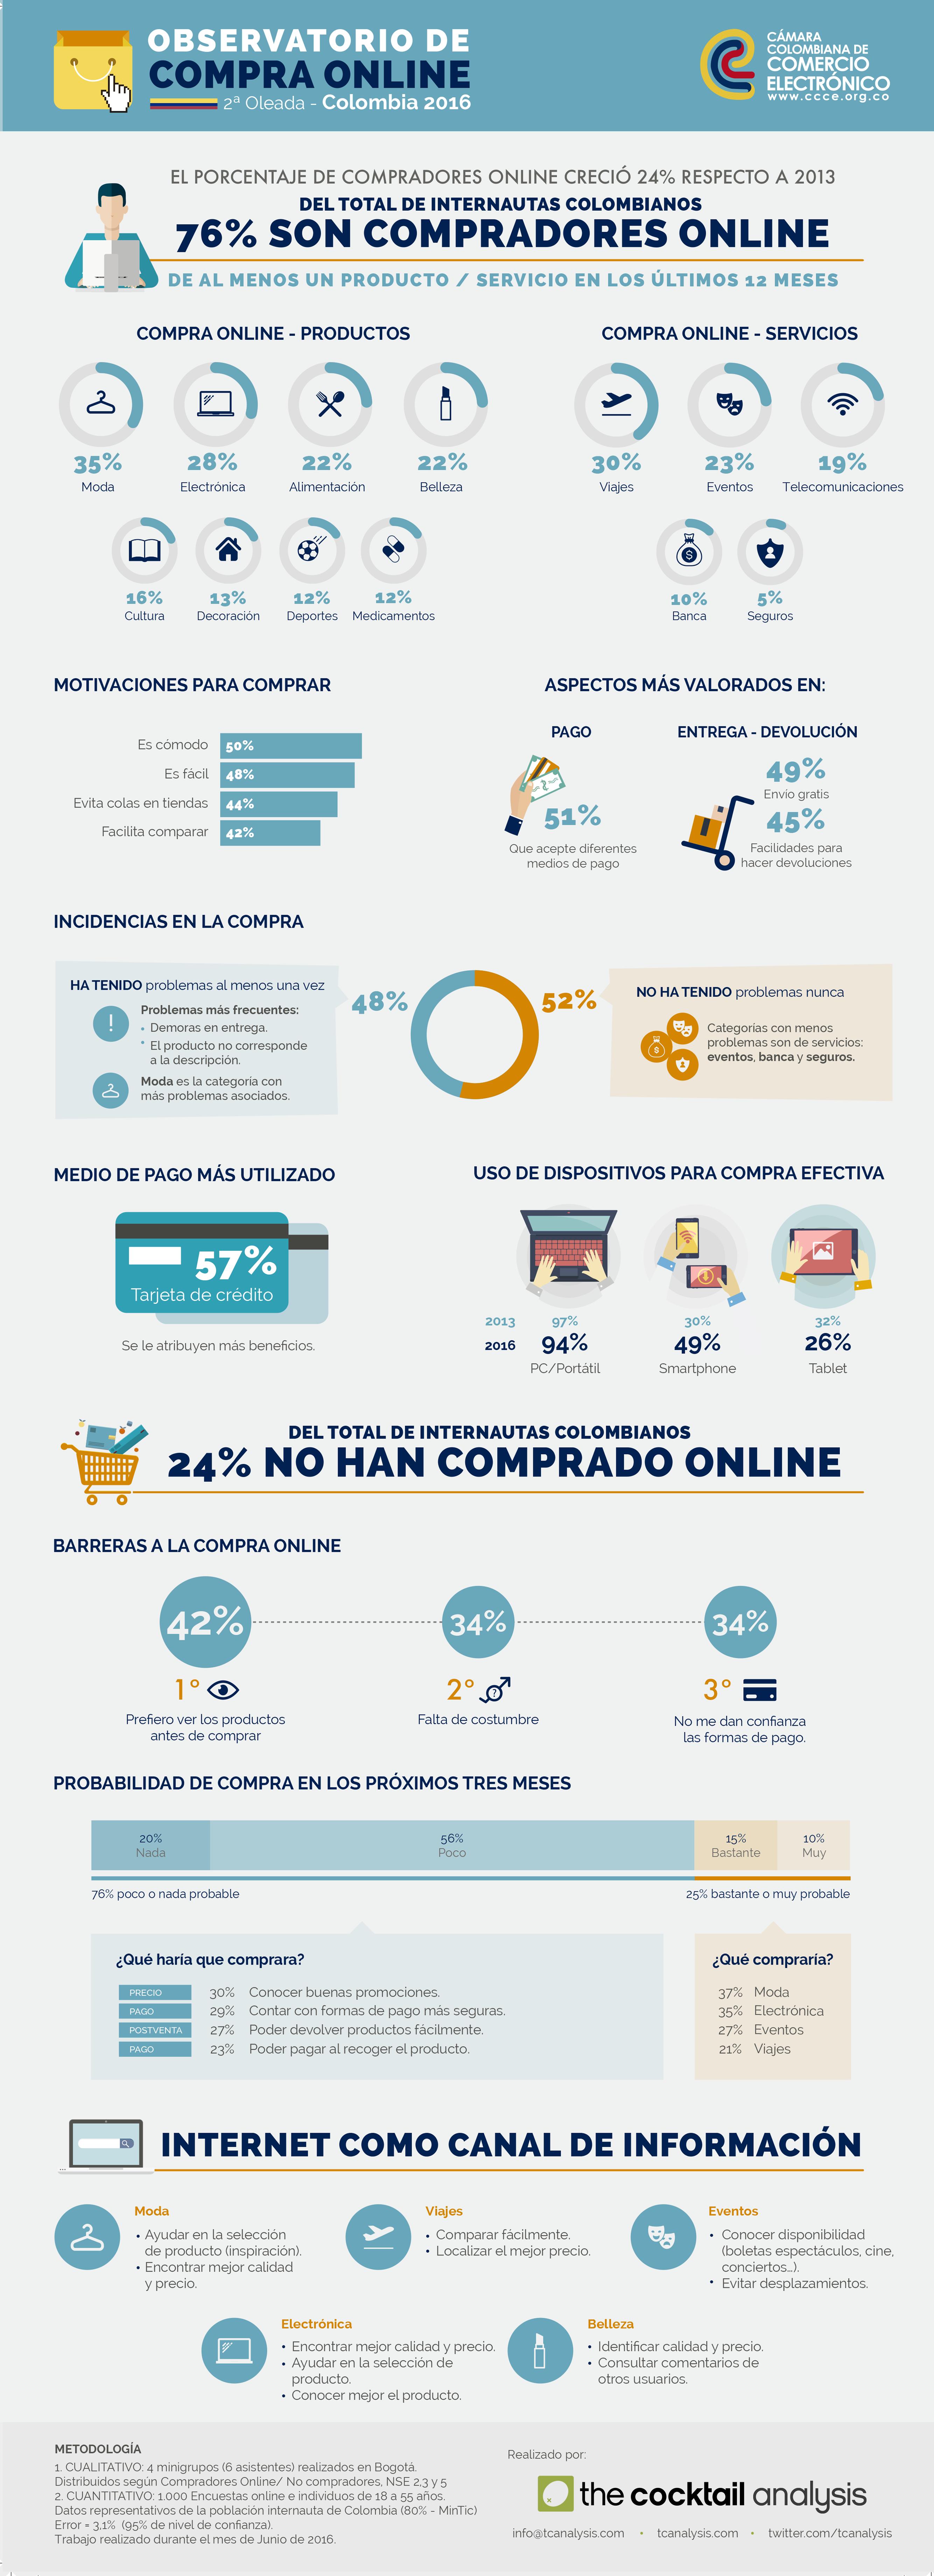 Infografa_Habitos_consumidor_Colombia_2016.png